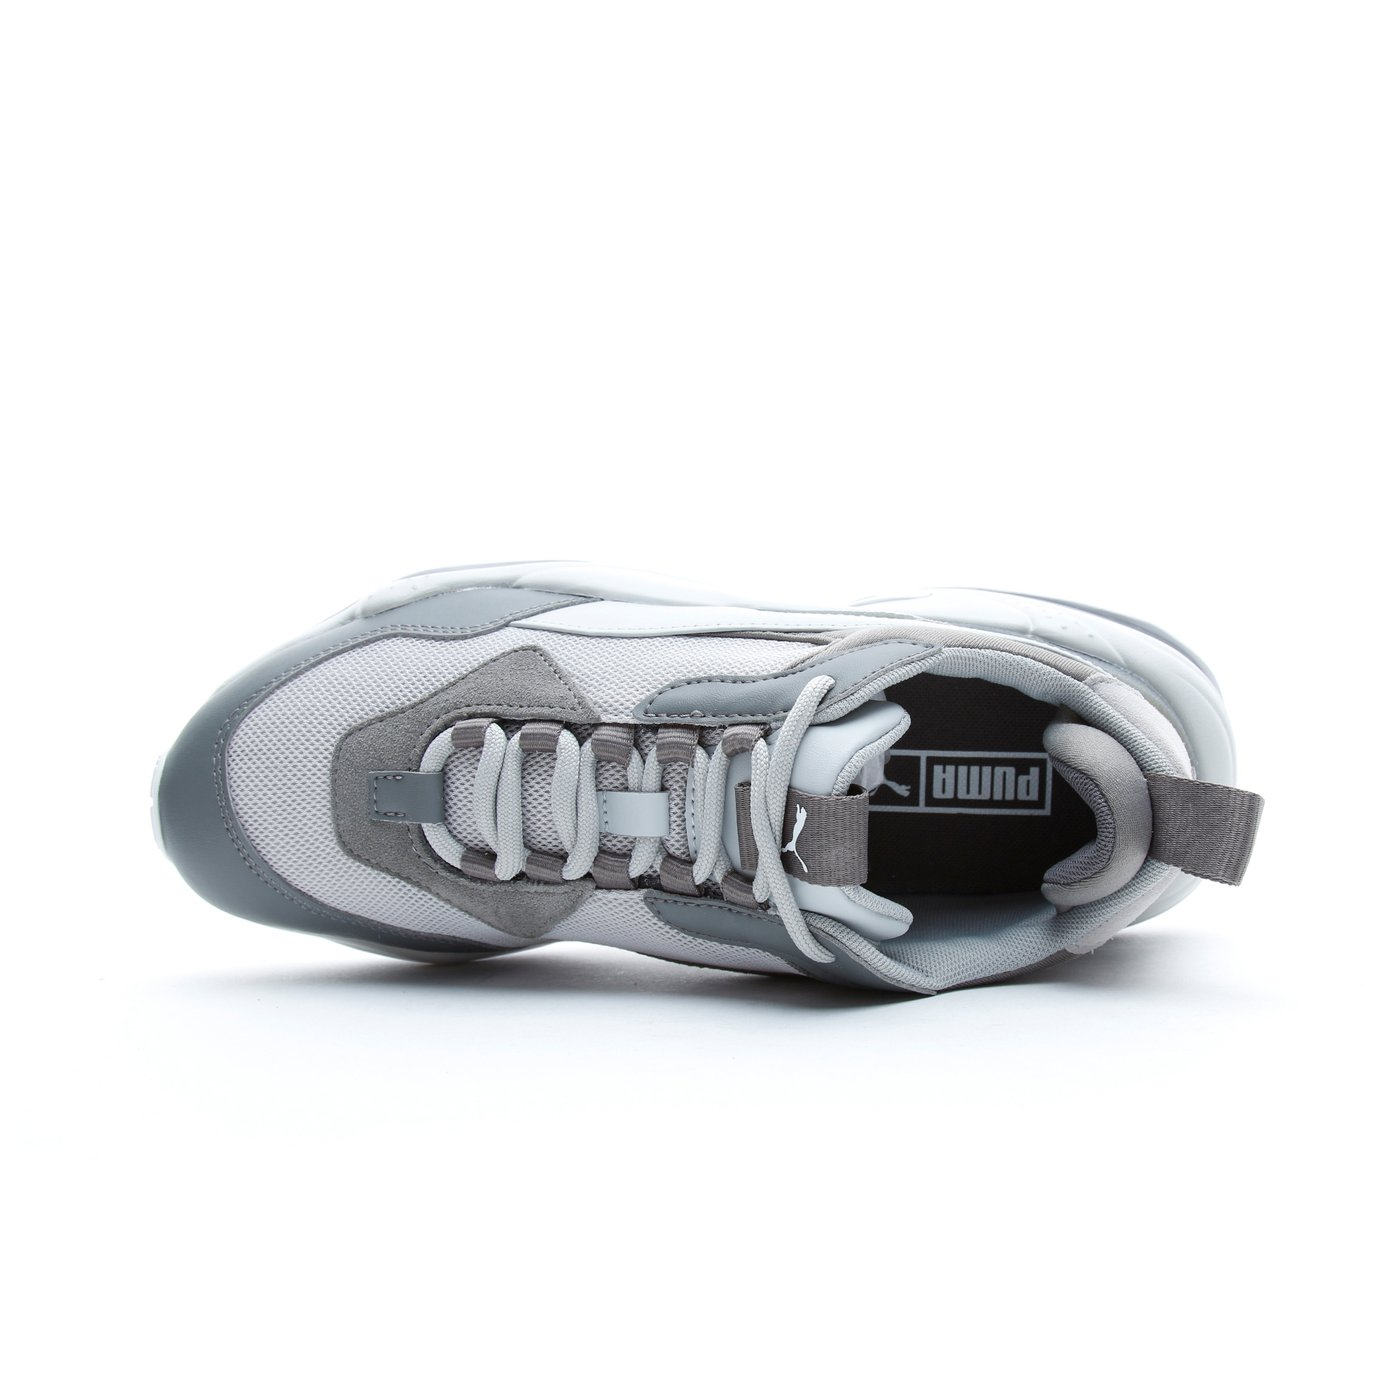 Puma Thunder Fashion 2.2 Erkek Gri Spor Ayakkabı